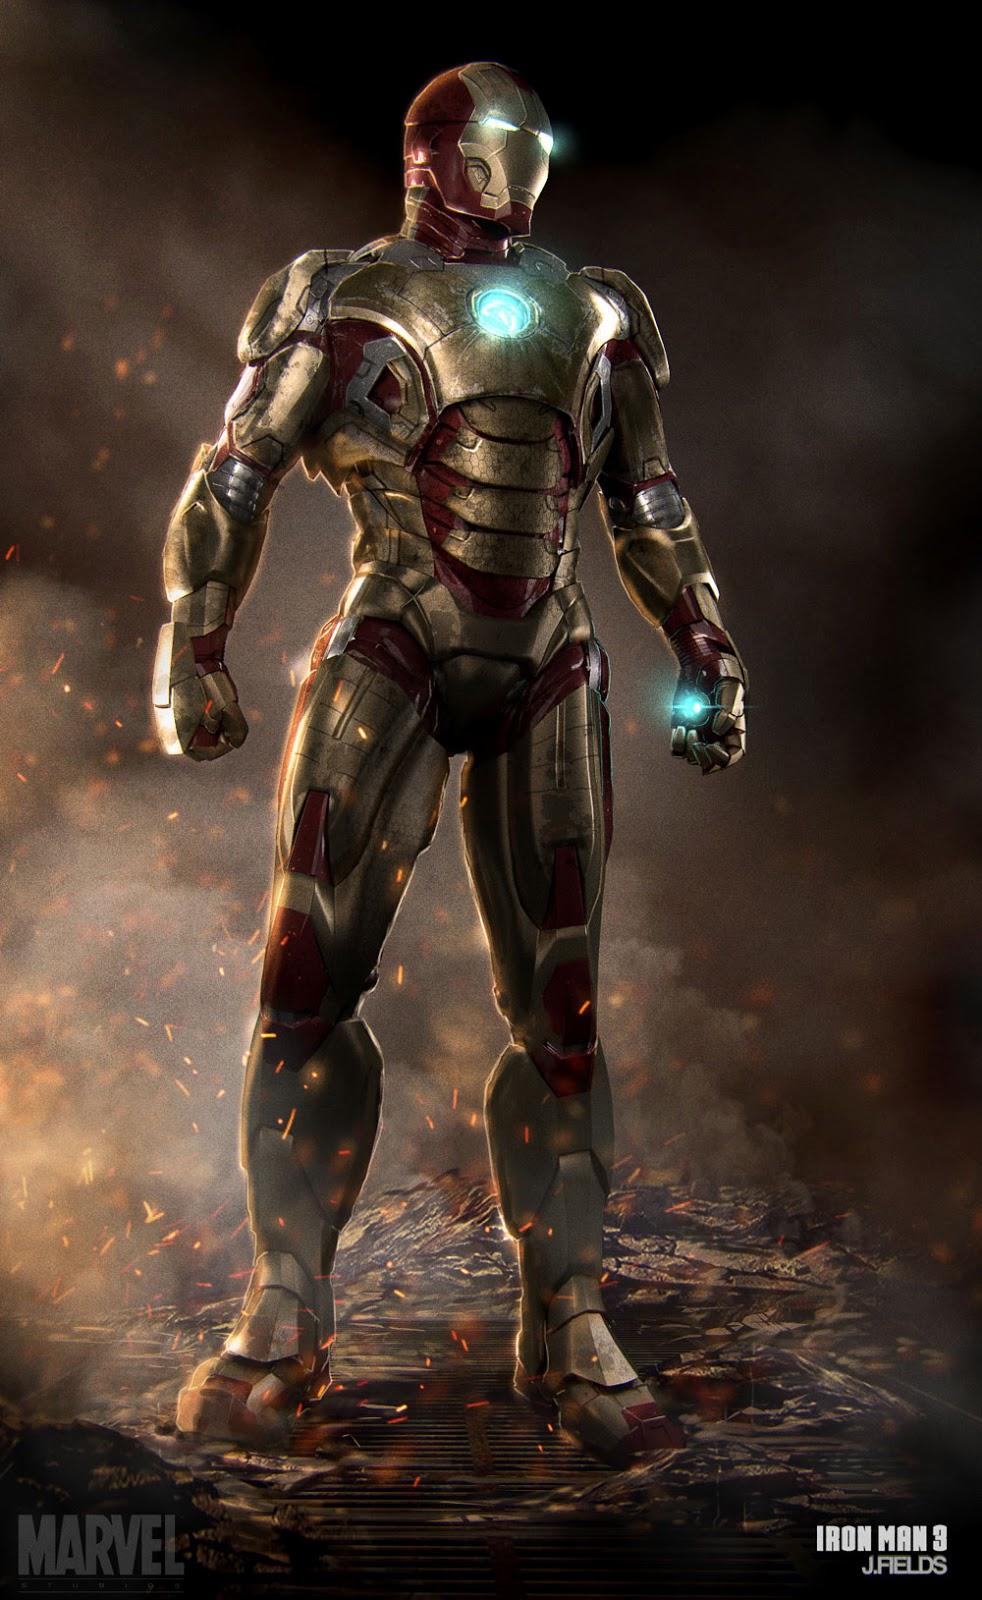 justin-fields-Iron-Man-3_justinfields.com_Armor2.jpg